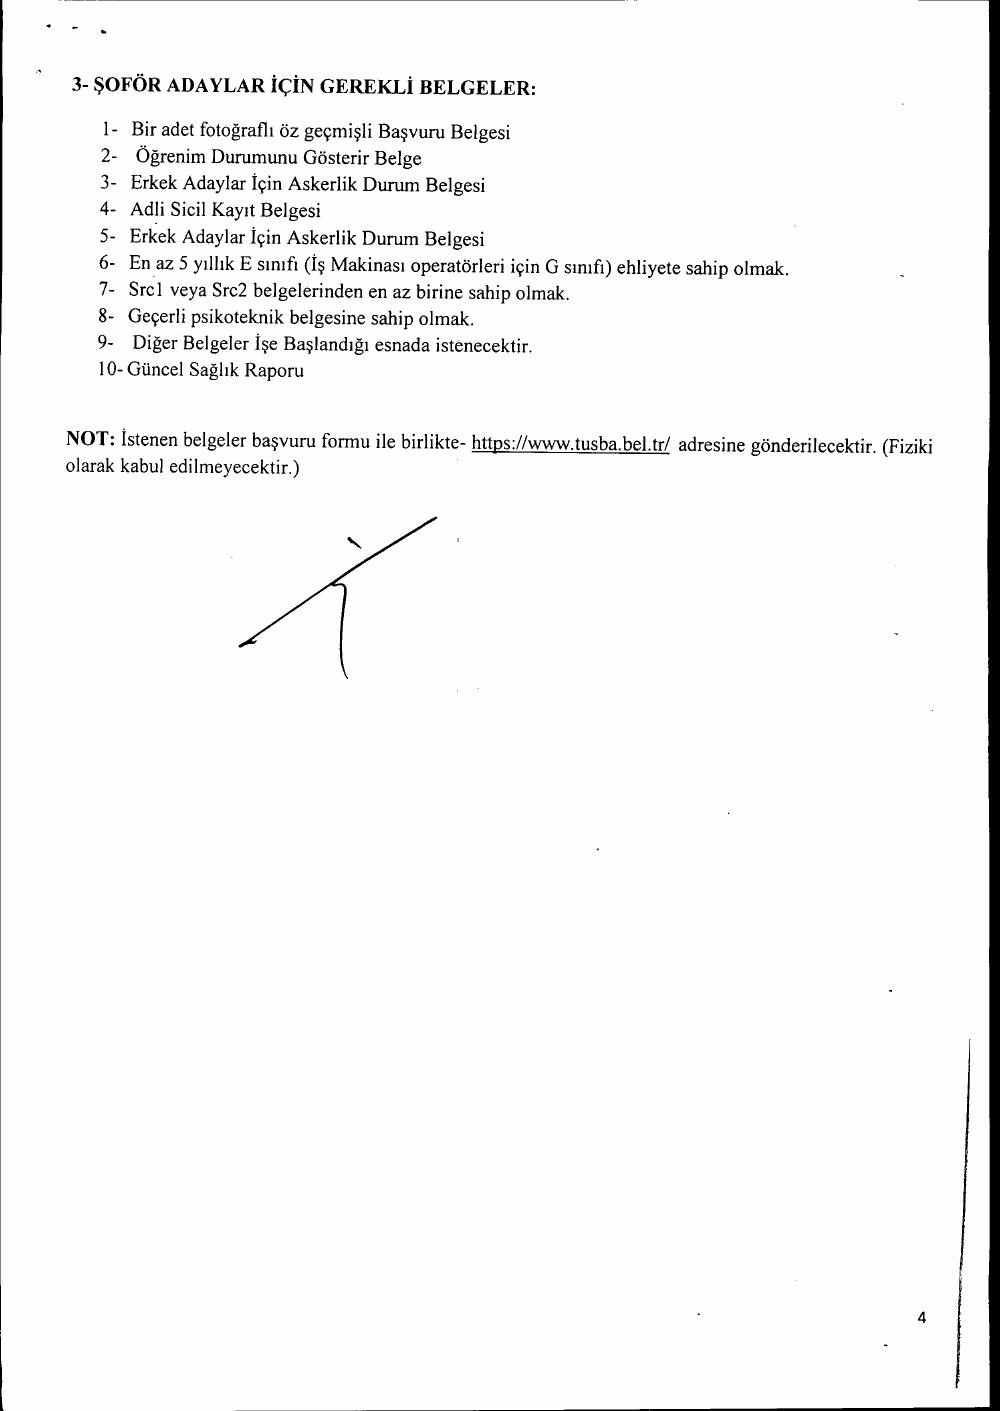 van-tusba-kent-hizmetleri-tic-a-s-03-05-2021-000005.png